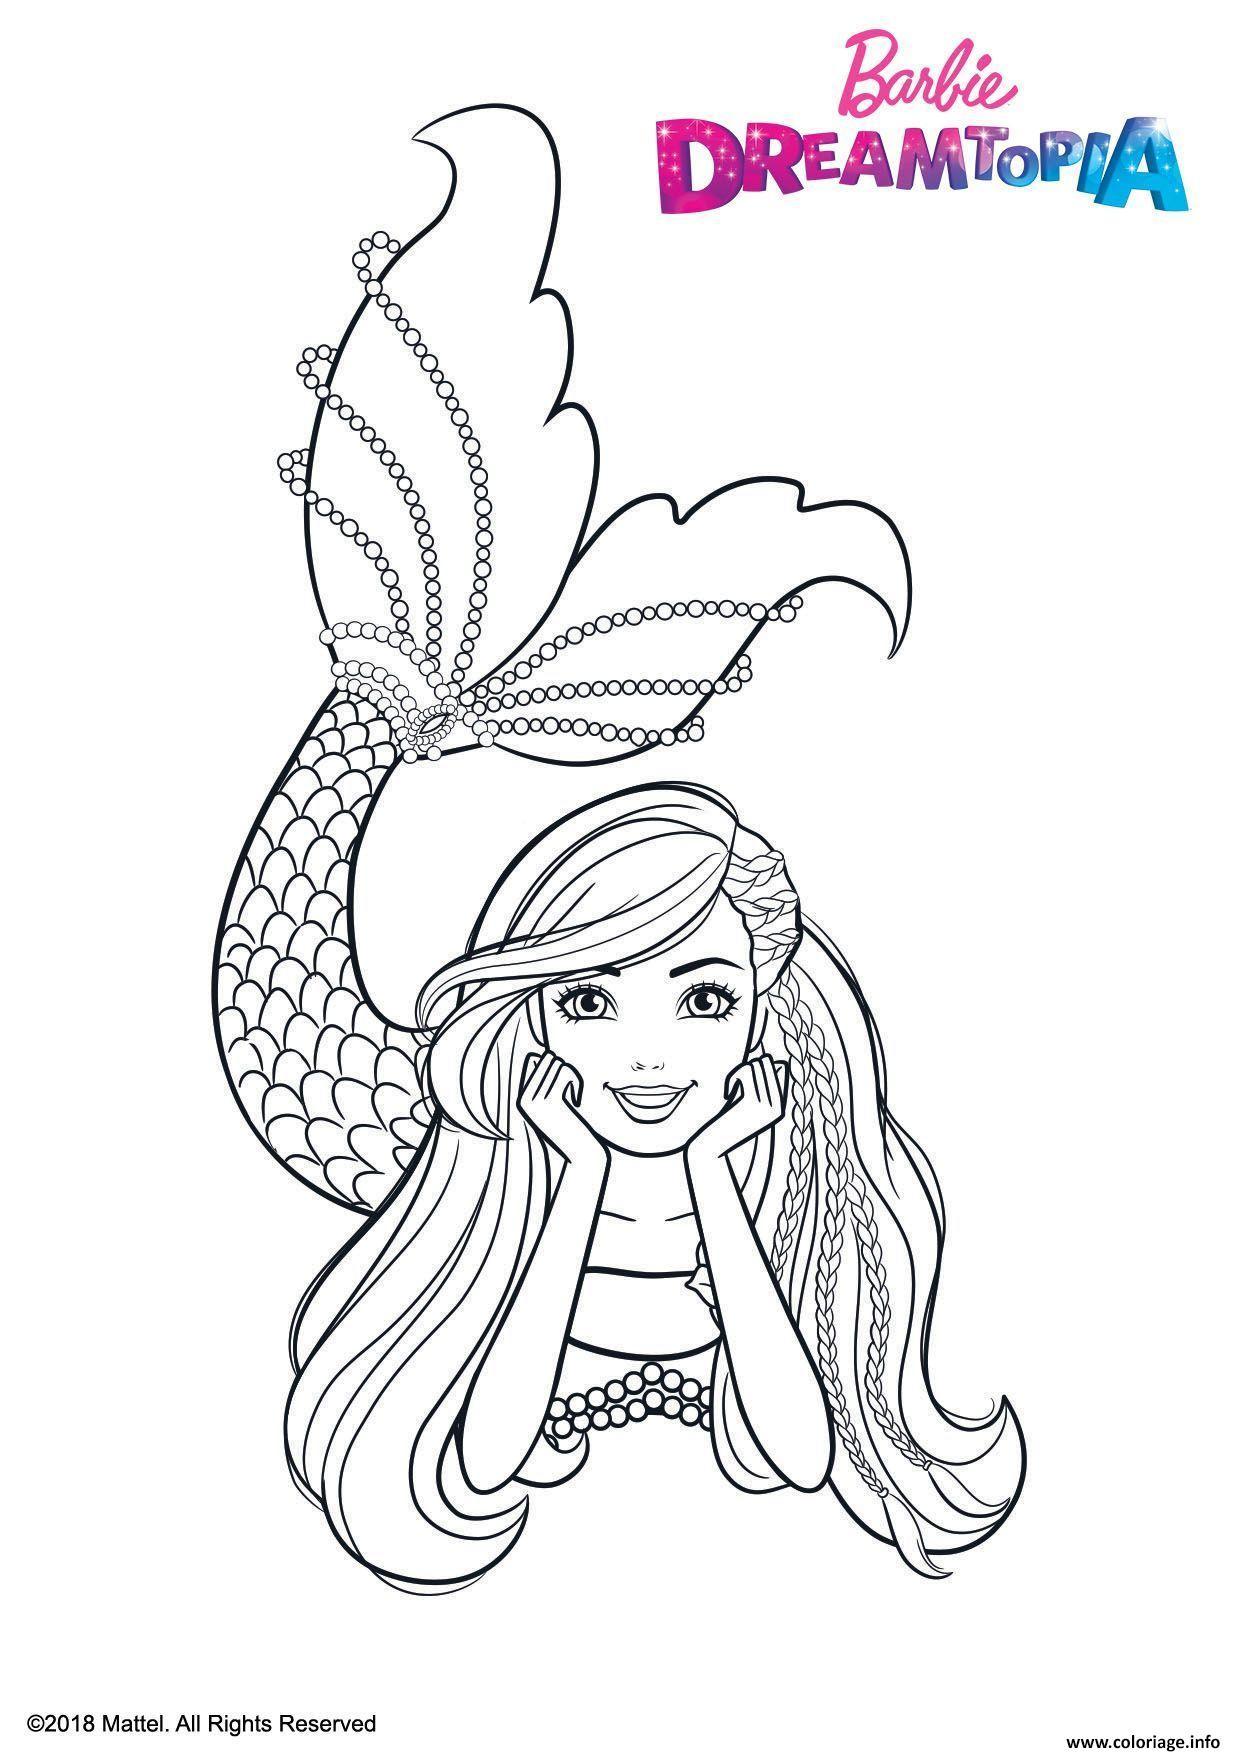 Coloriage Barbie Sirene Multicolore Dessin Barbie à imprimer